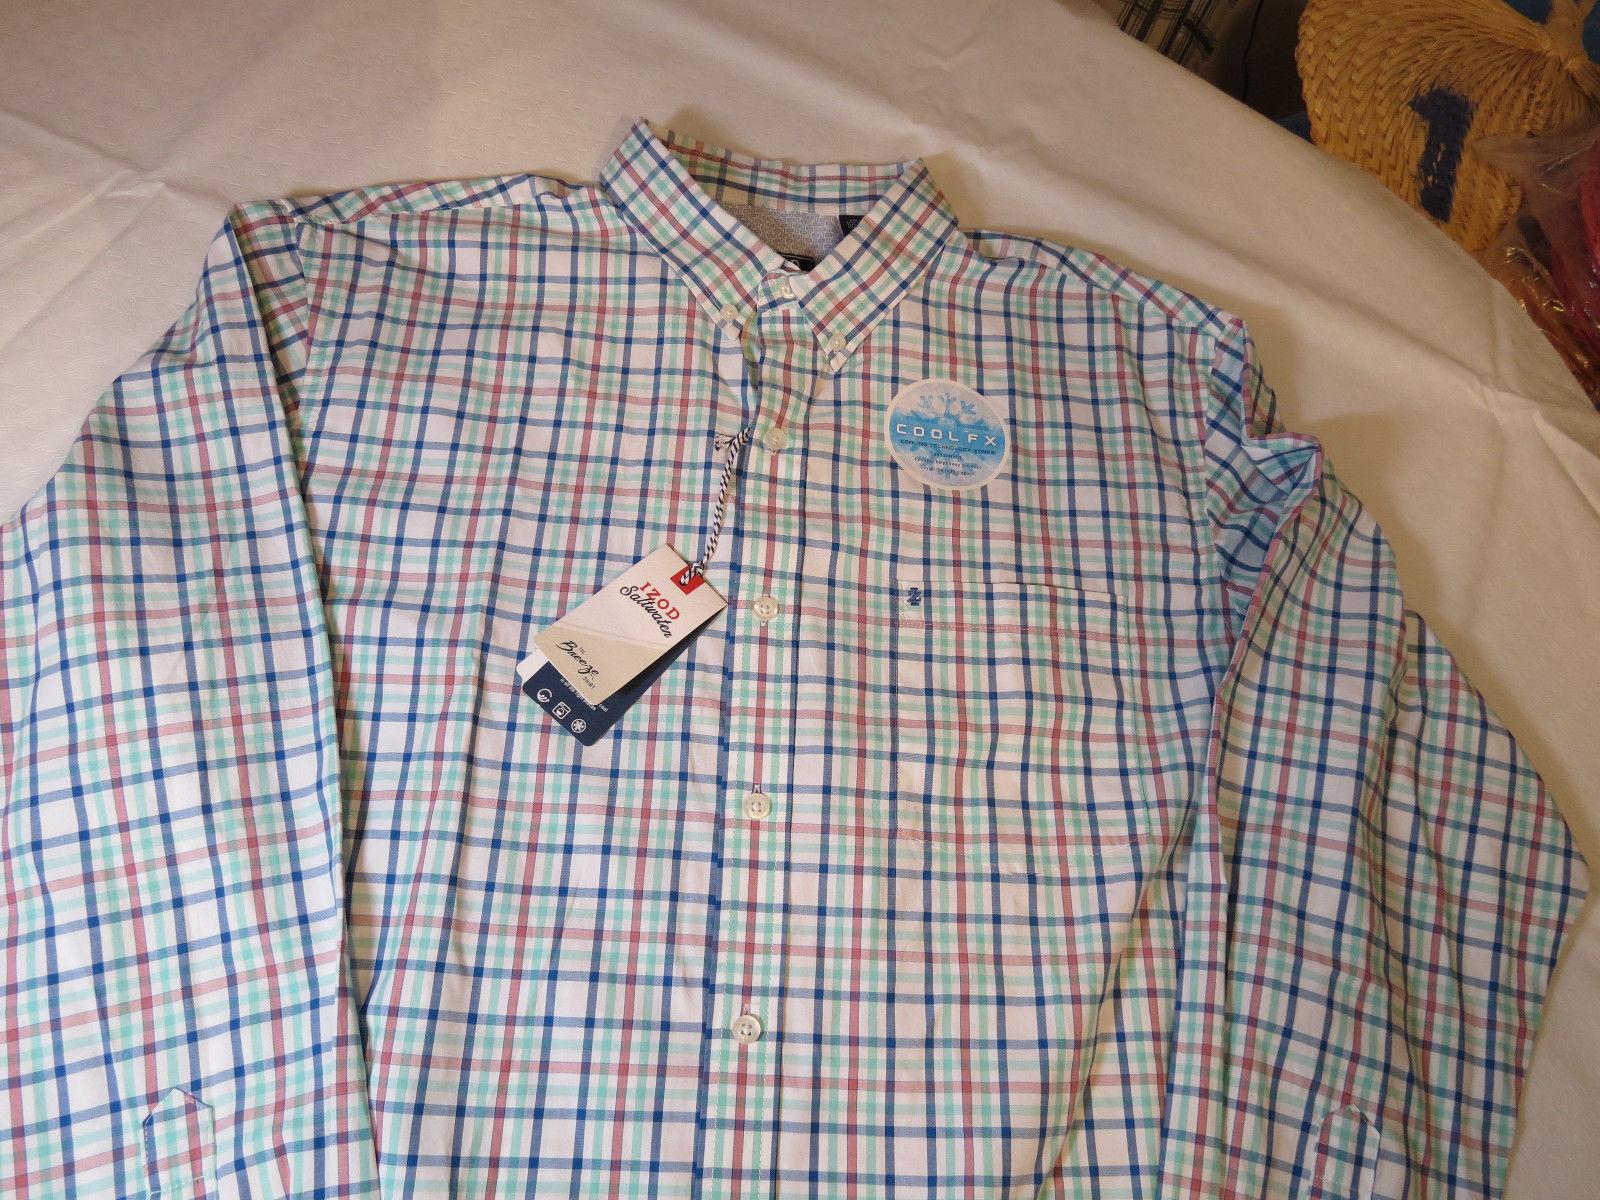 Mens Izod Saltwater The Breeze Shirt L/S button up shirt L Cascade 506503 white